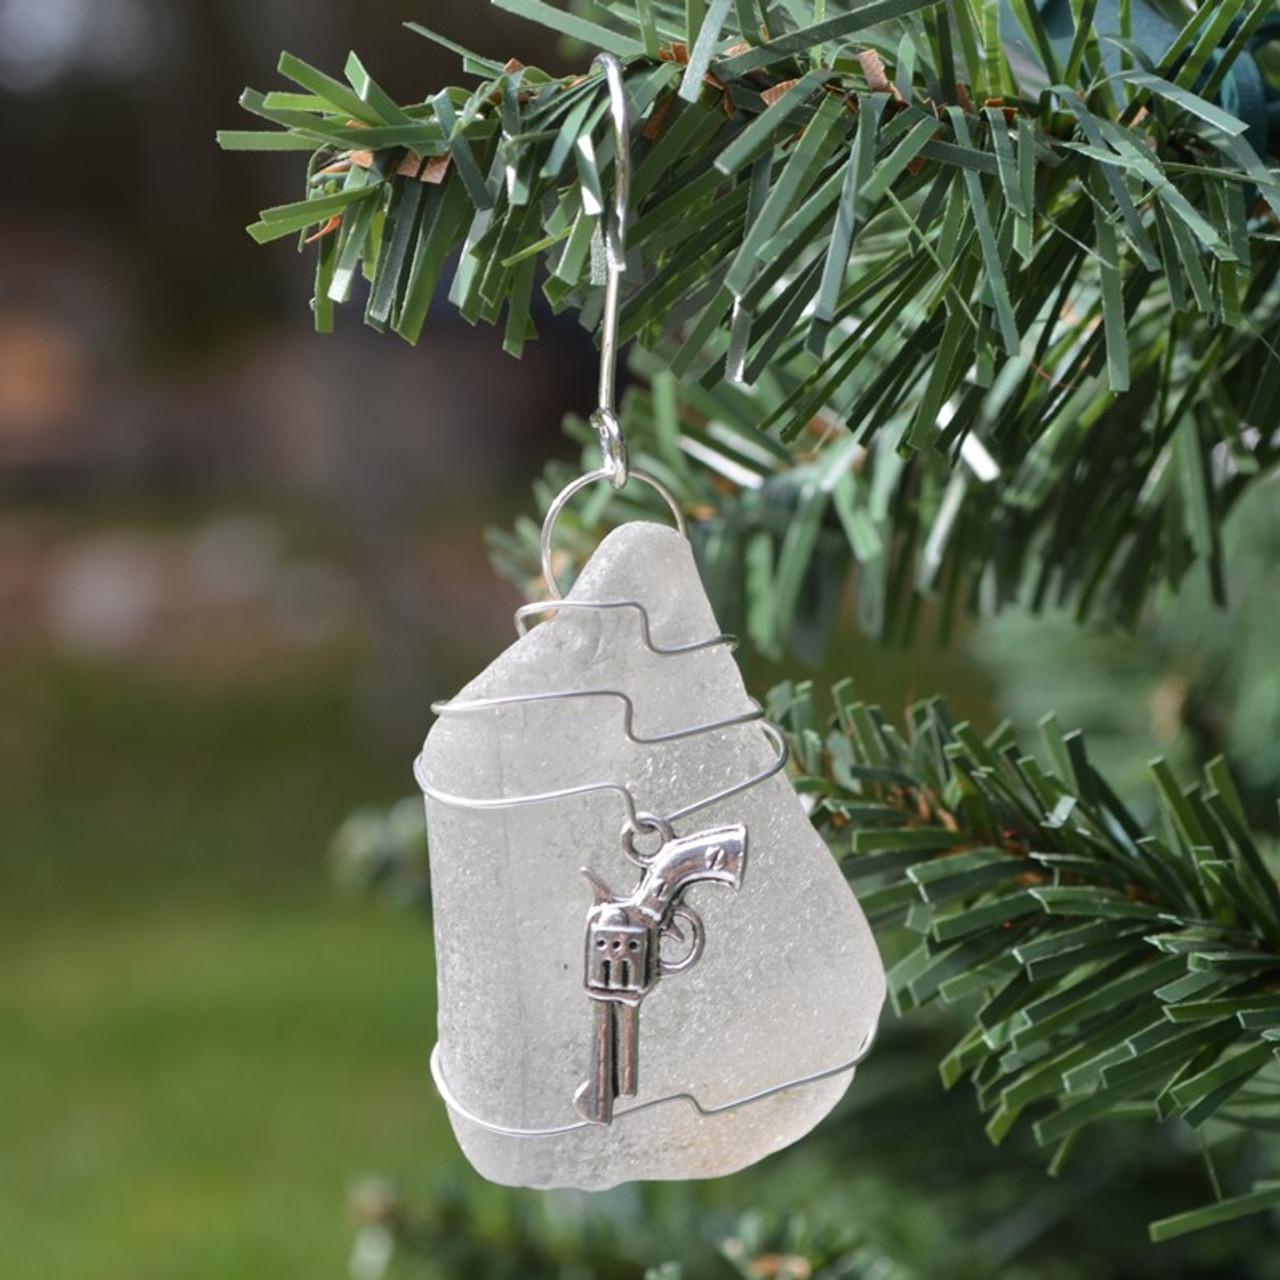 NRA Ornament